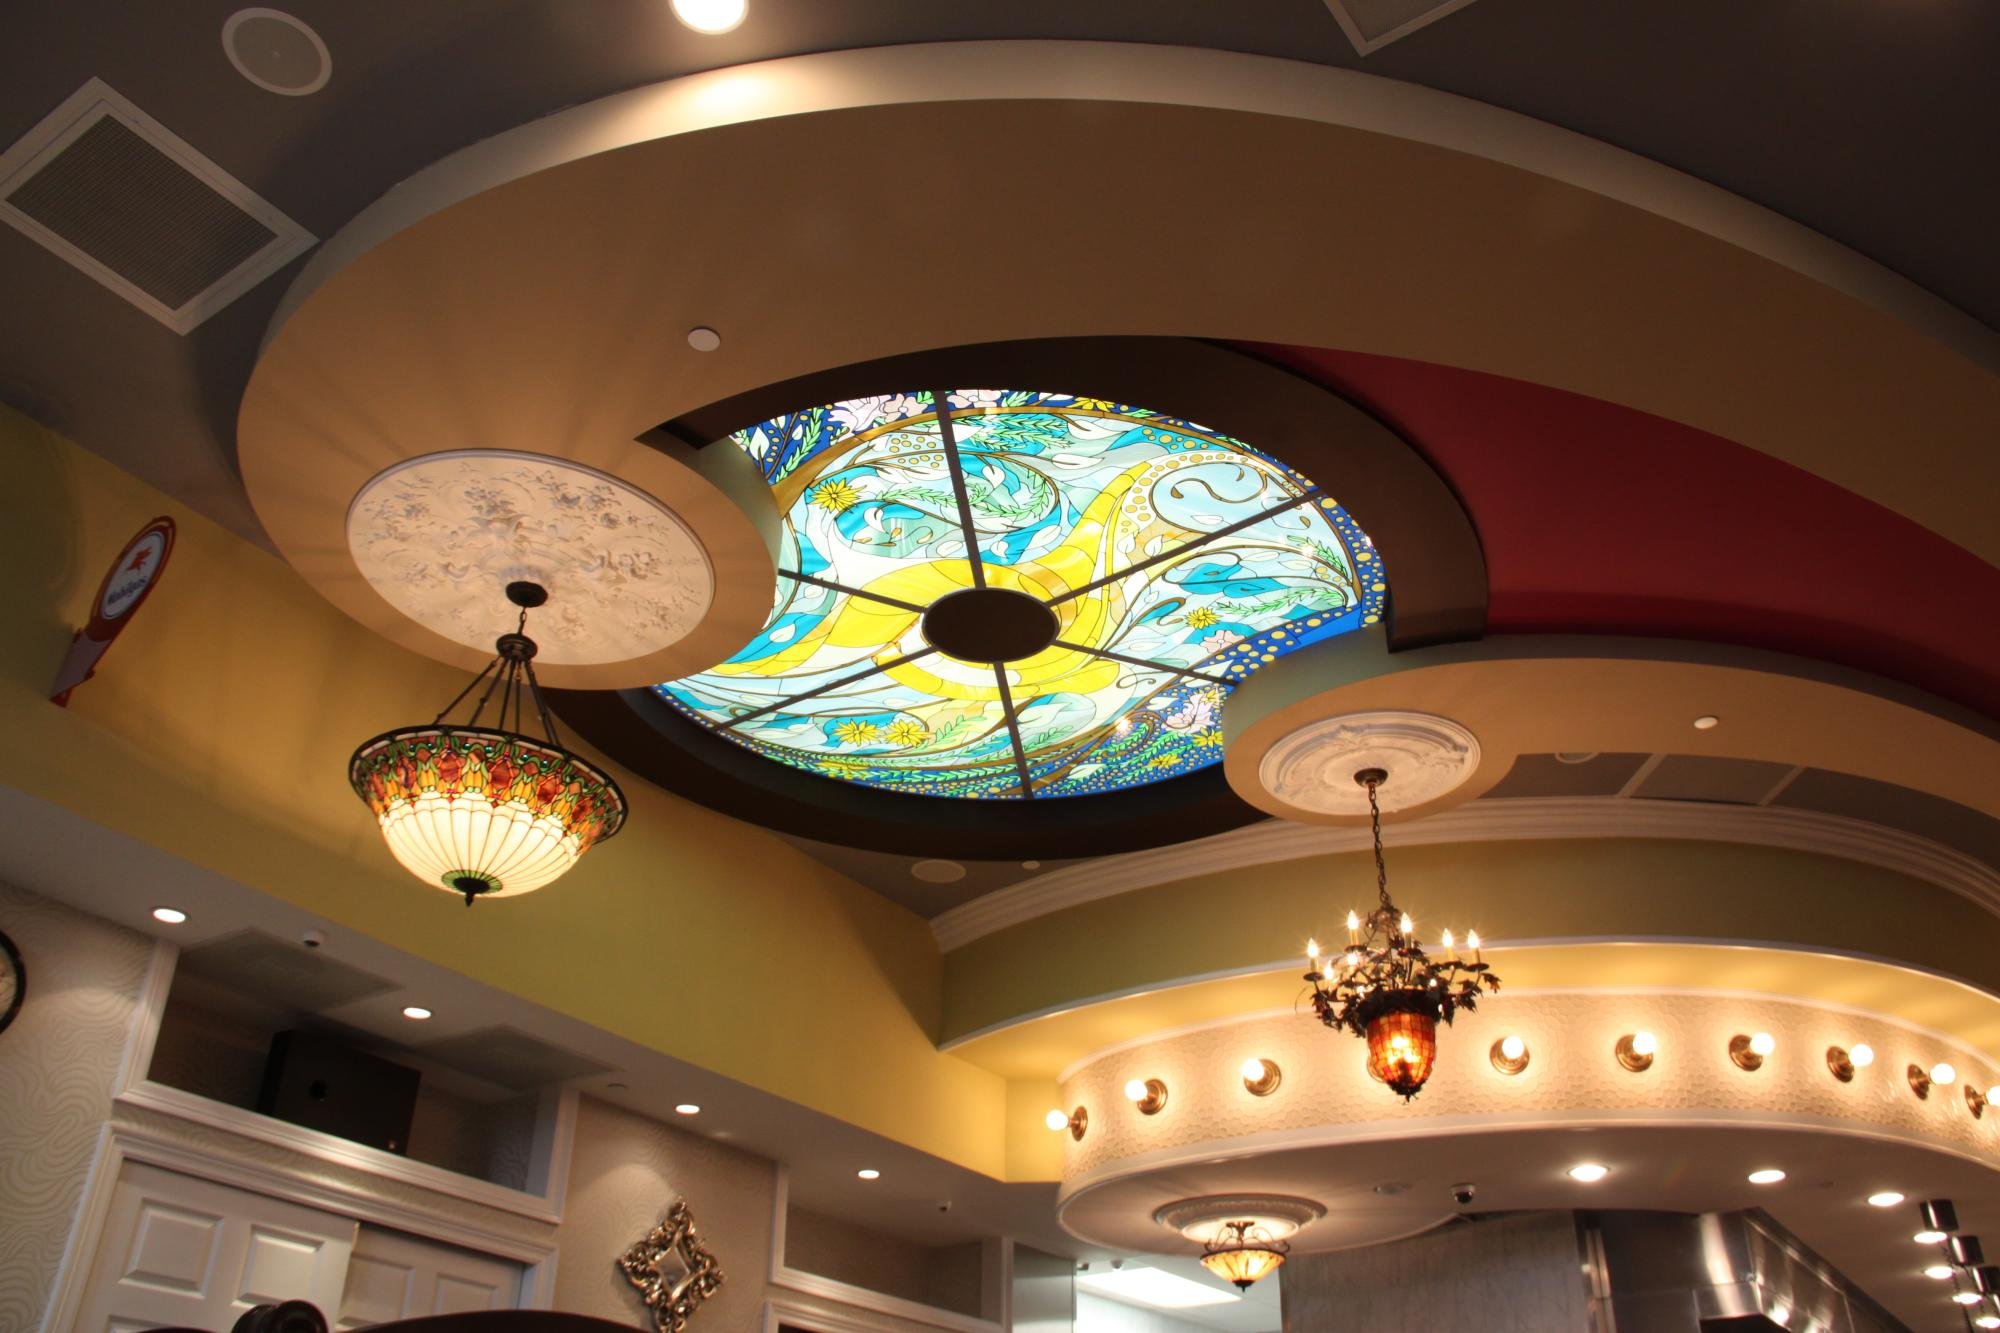 Home Furnishings, Home Decor, Furniture Store  Boca Raton, FL